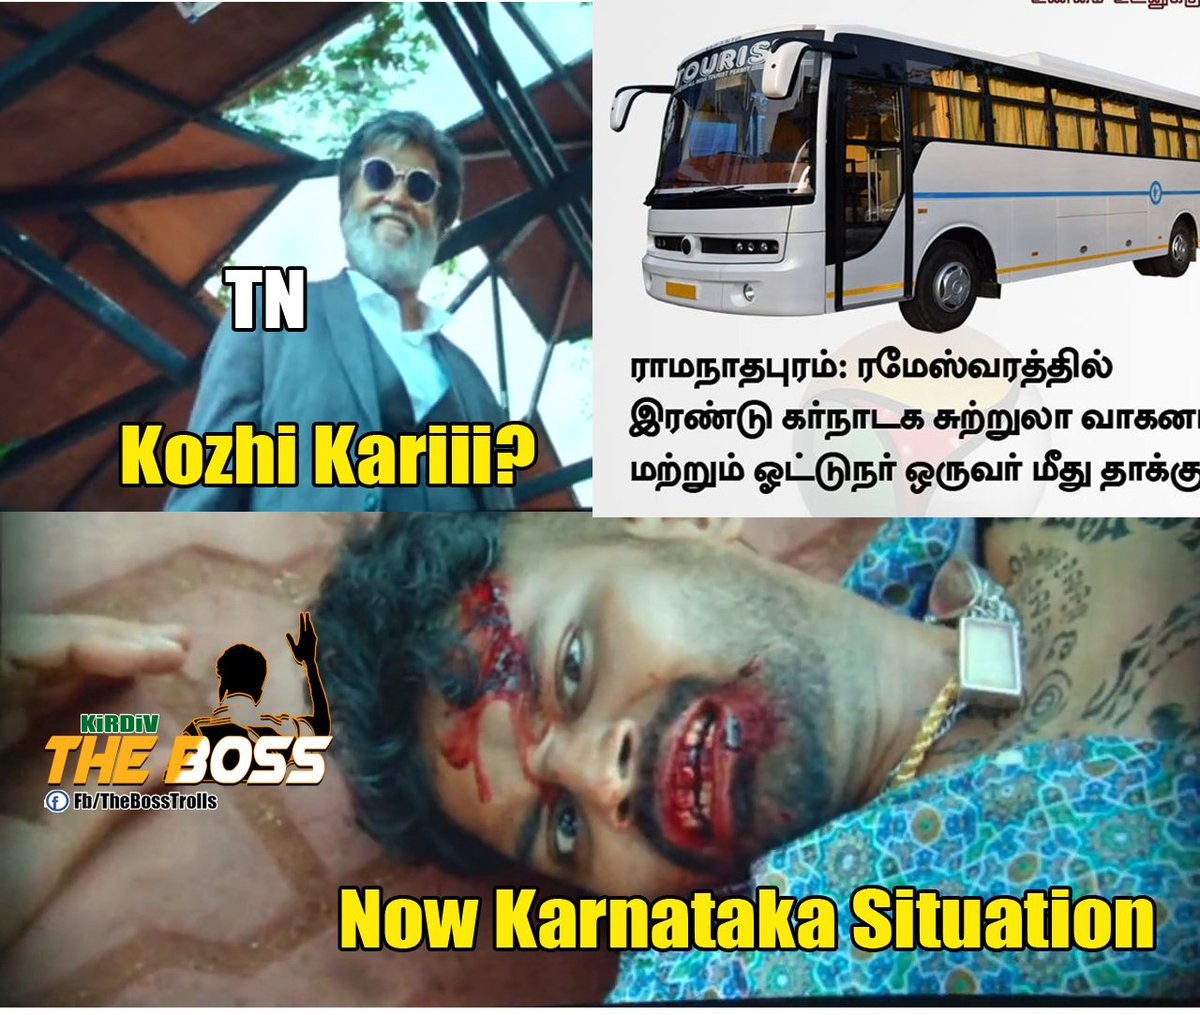 Illa Trol: Cauvery Issue Tamilnadu Vs Karnataka Memes